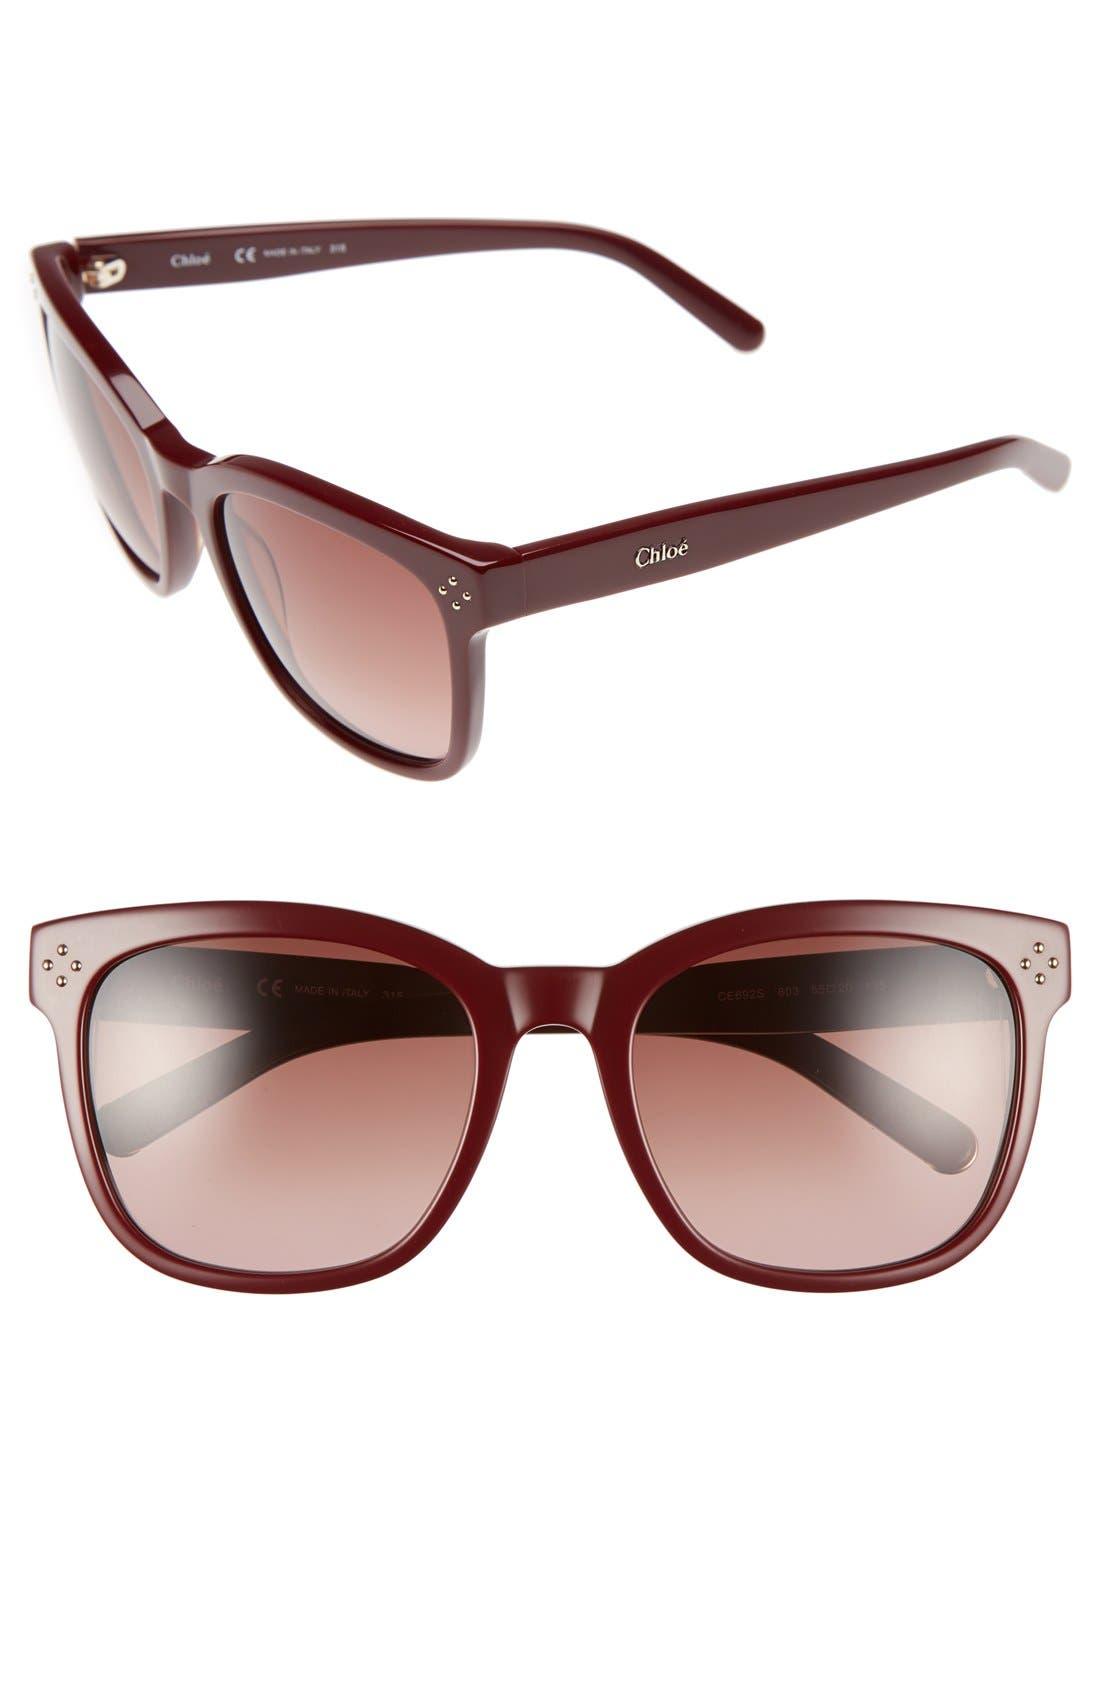 Chloé 'Boxwood' 55mm Sunglasses